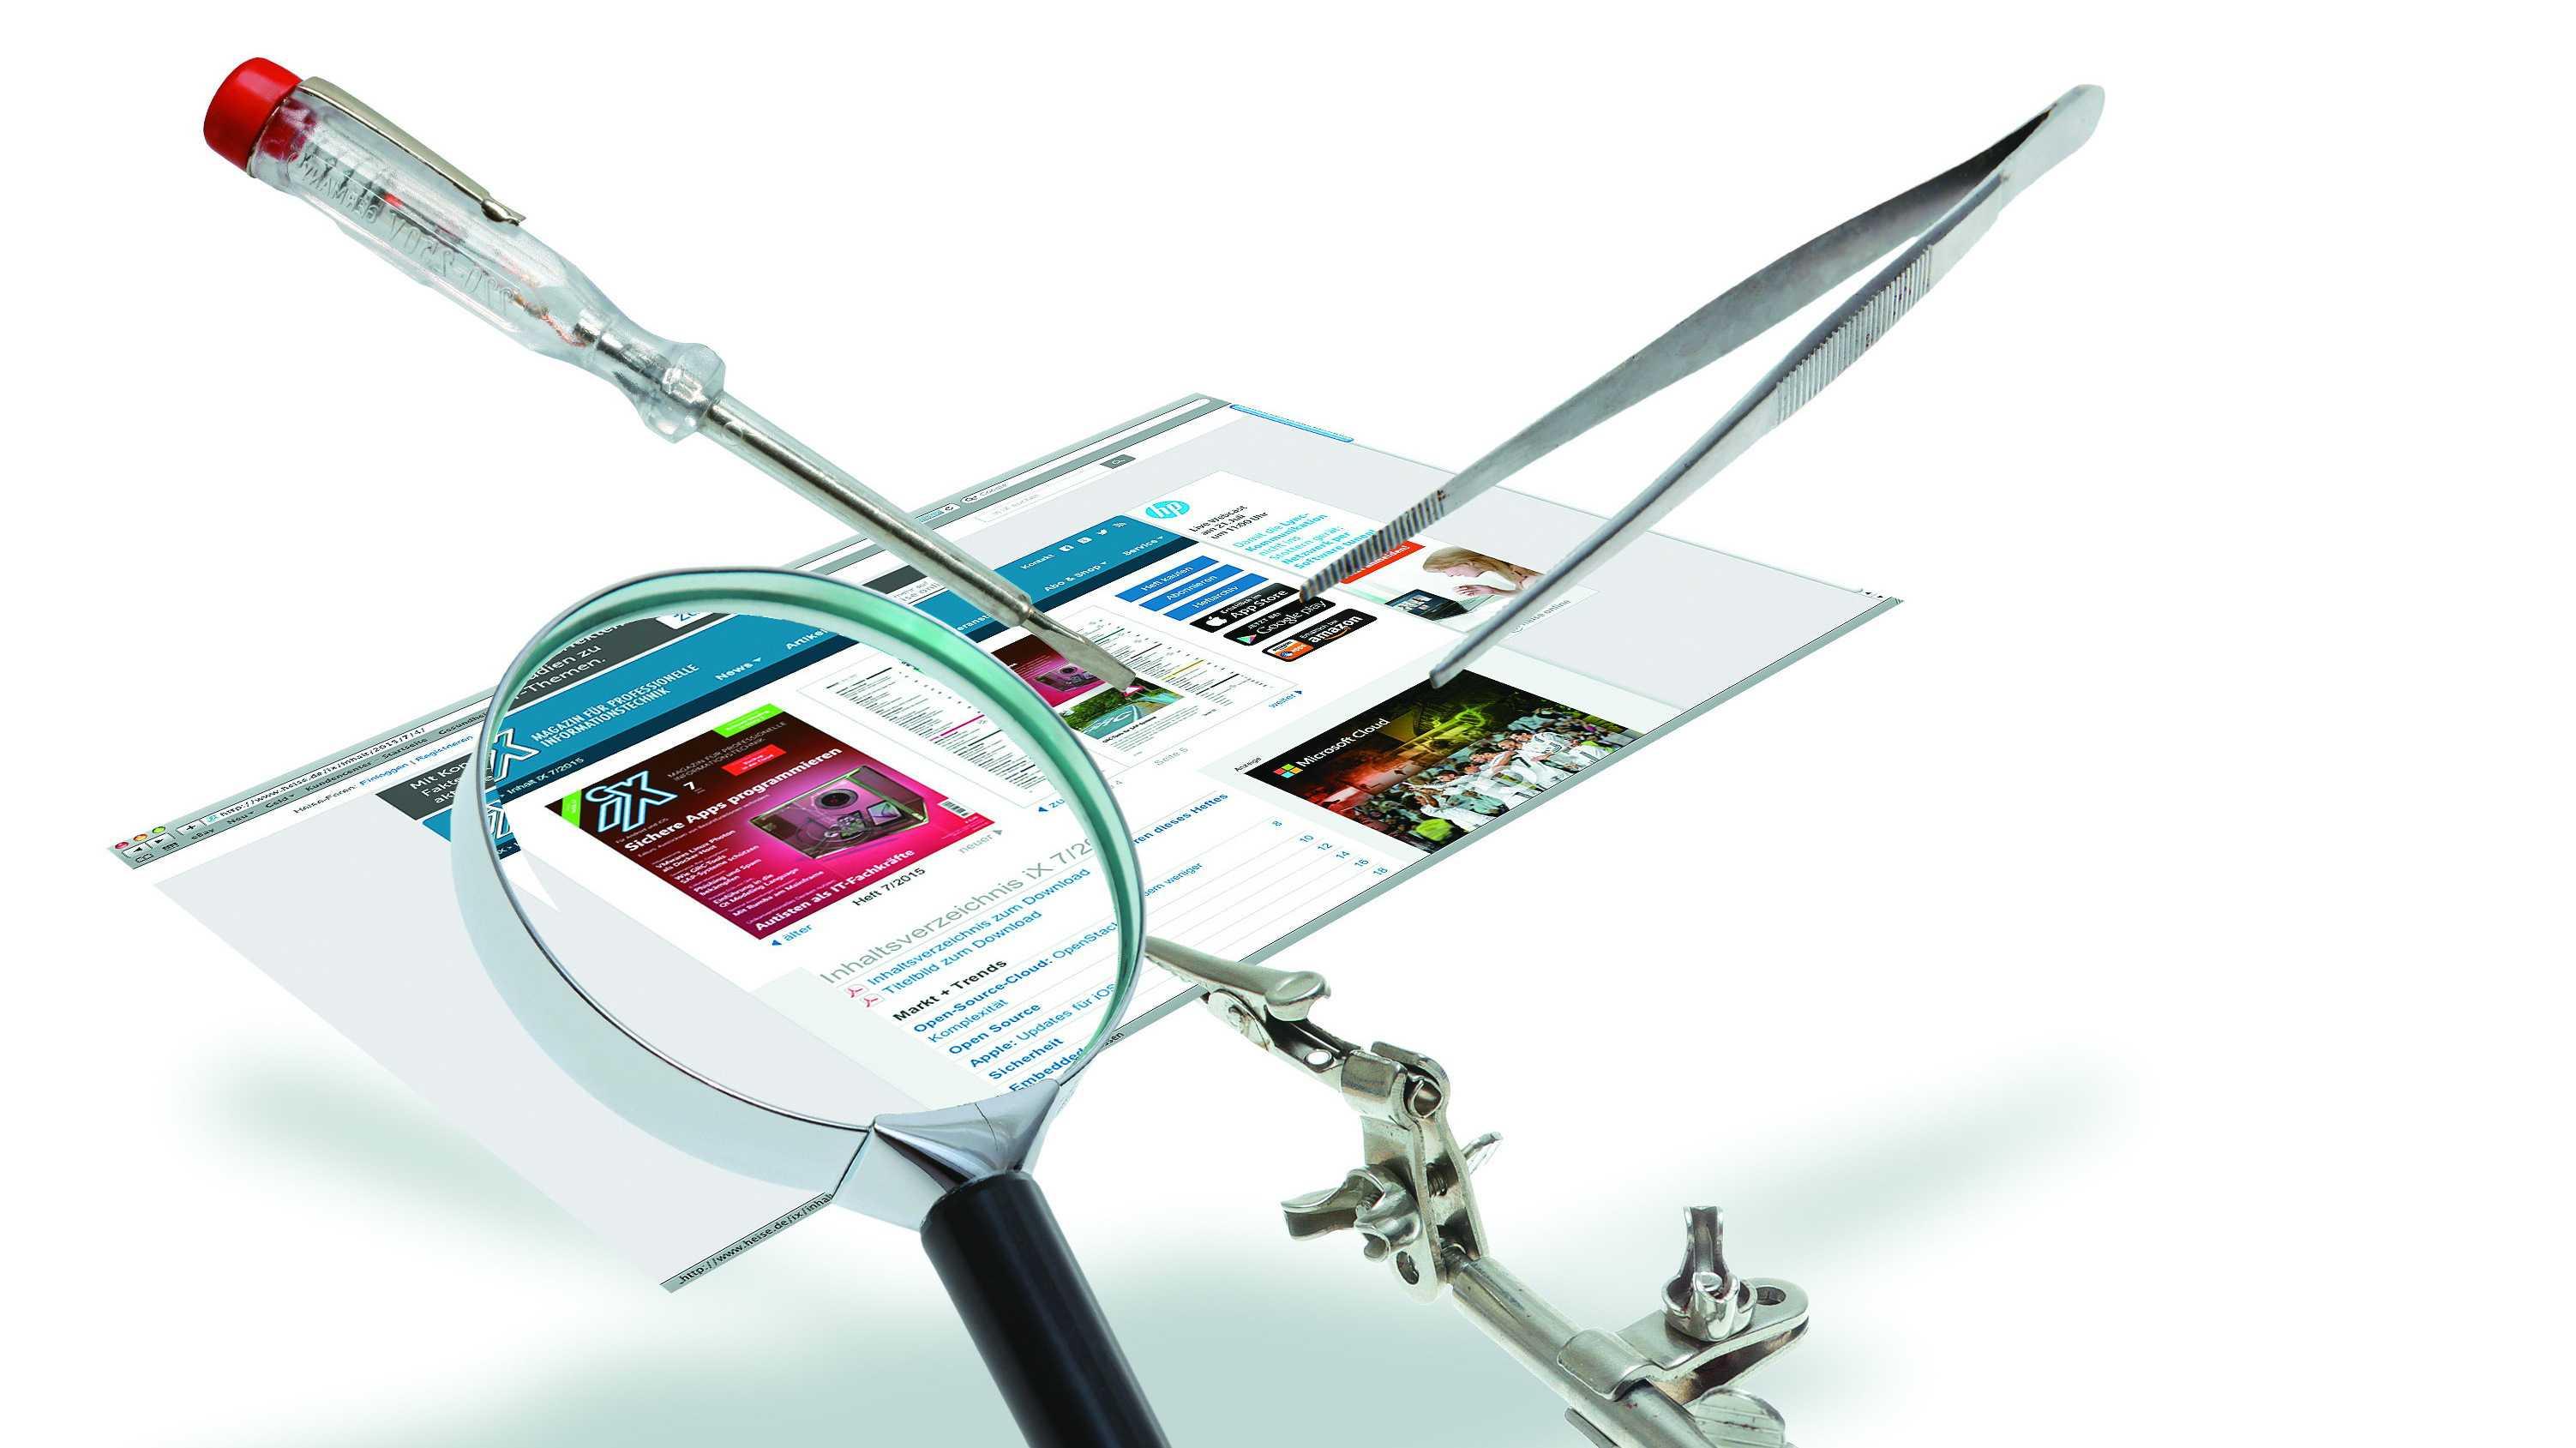 Application Insight akzeptiert nur noch Webanwendungen